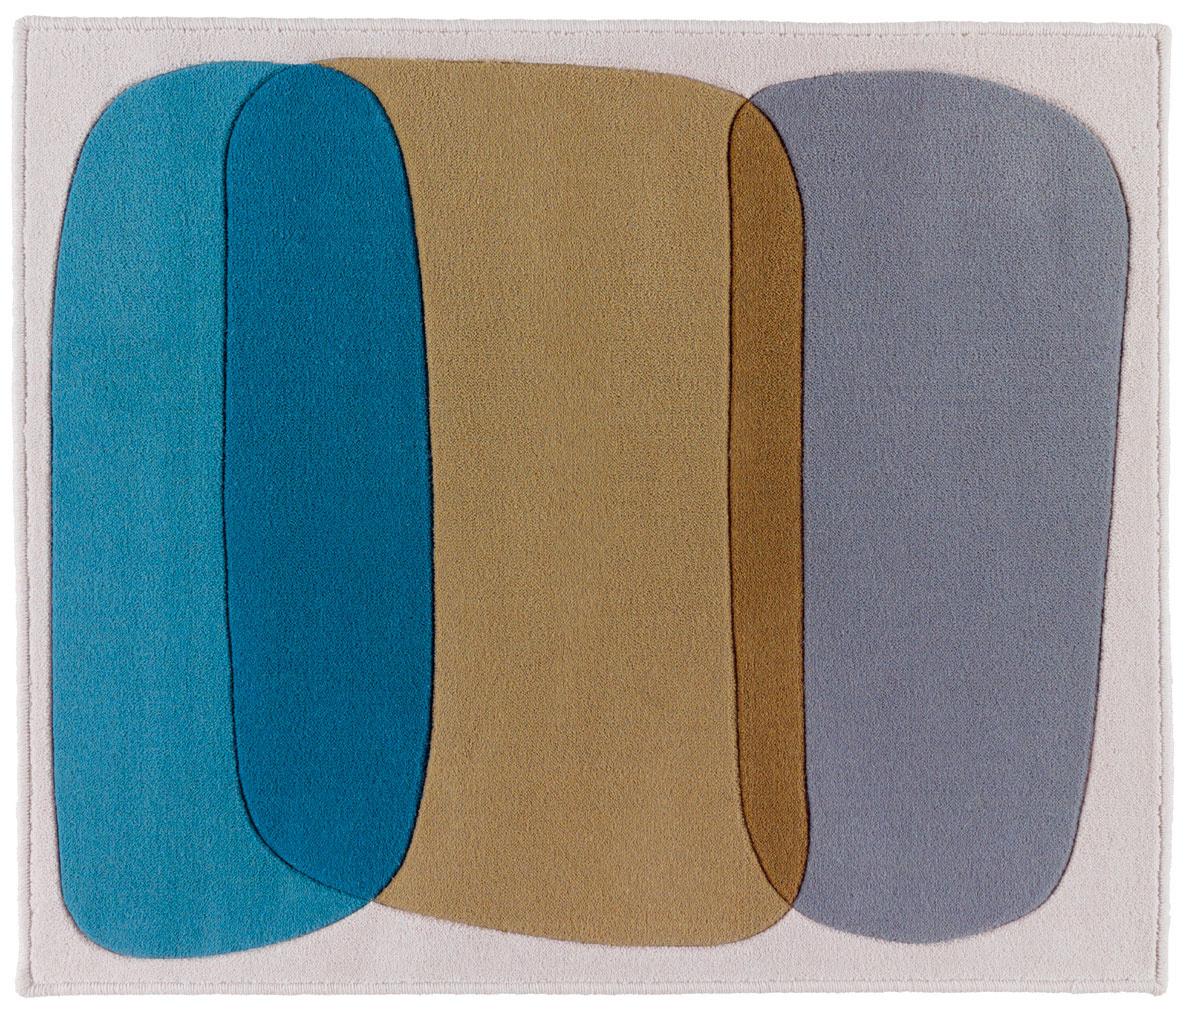 Koberec Malin Figur, vlna, nylon, 240 × 176 cm, 299 €, IKEA